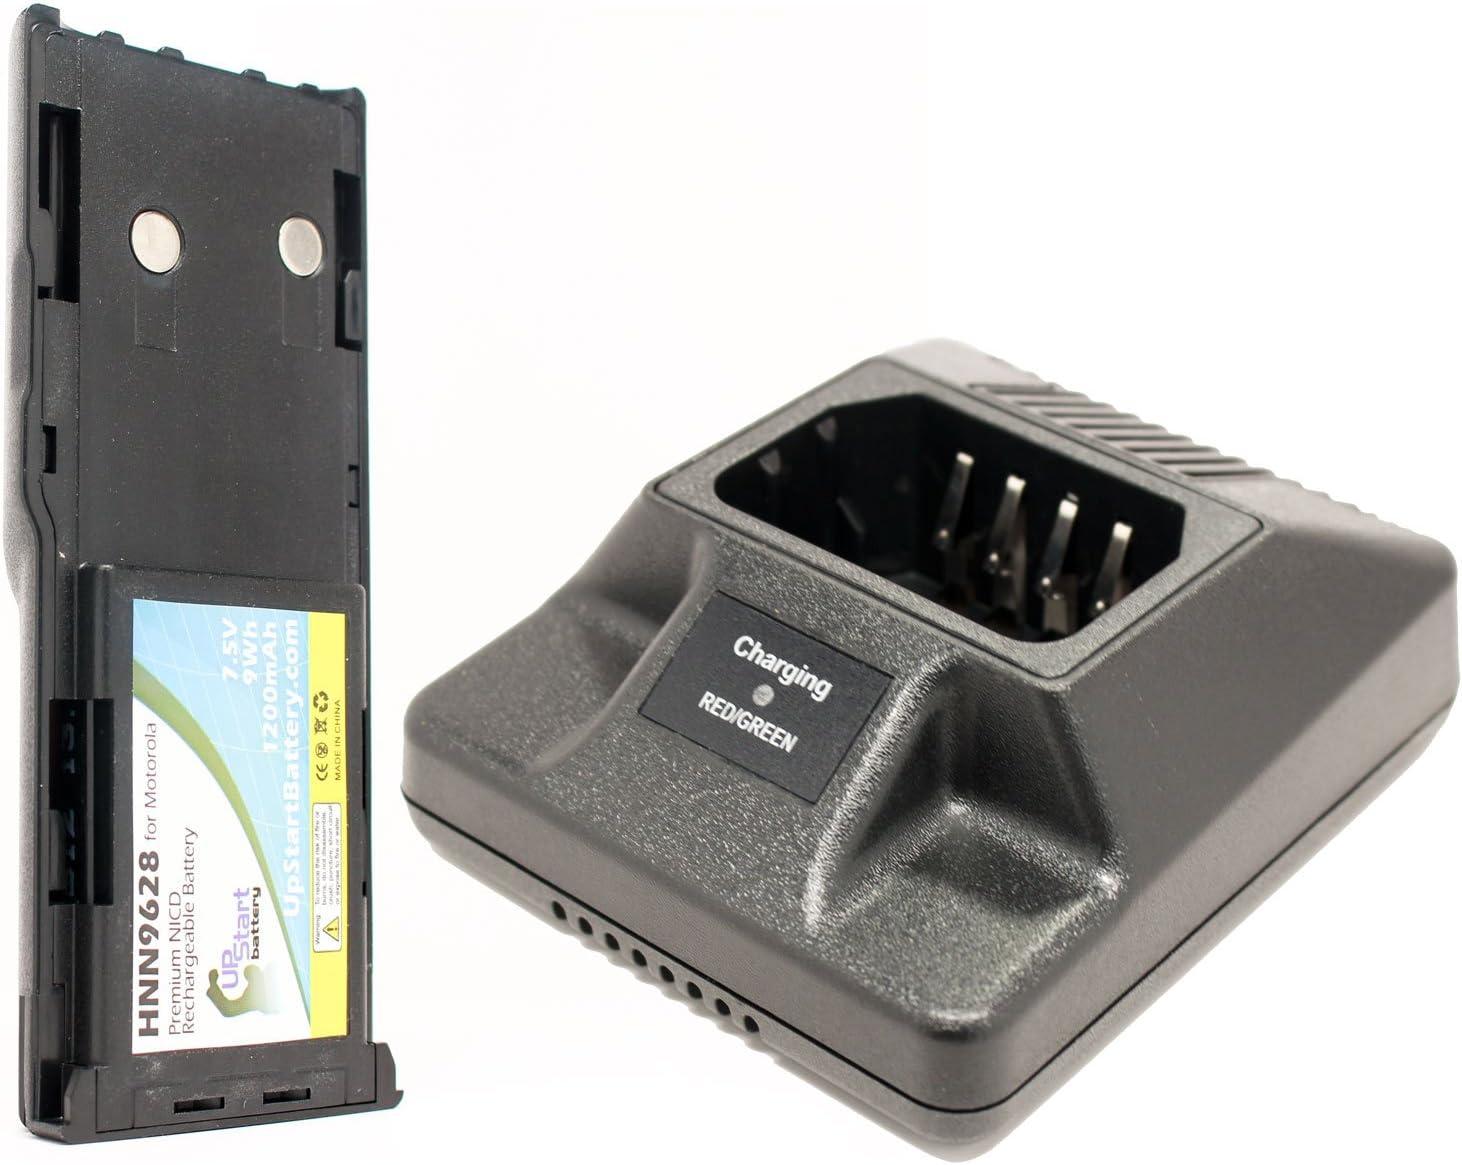 GP88S HNN9701A NICD 1200mAh Battery for Motorola Radius GP300 P080 HNN9628B